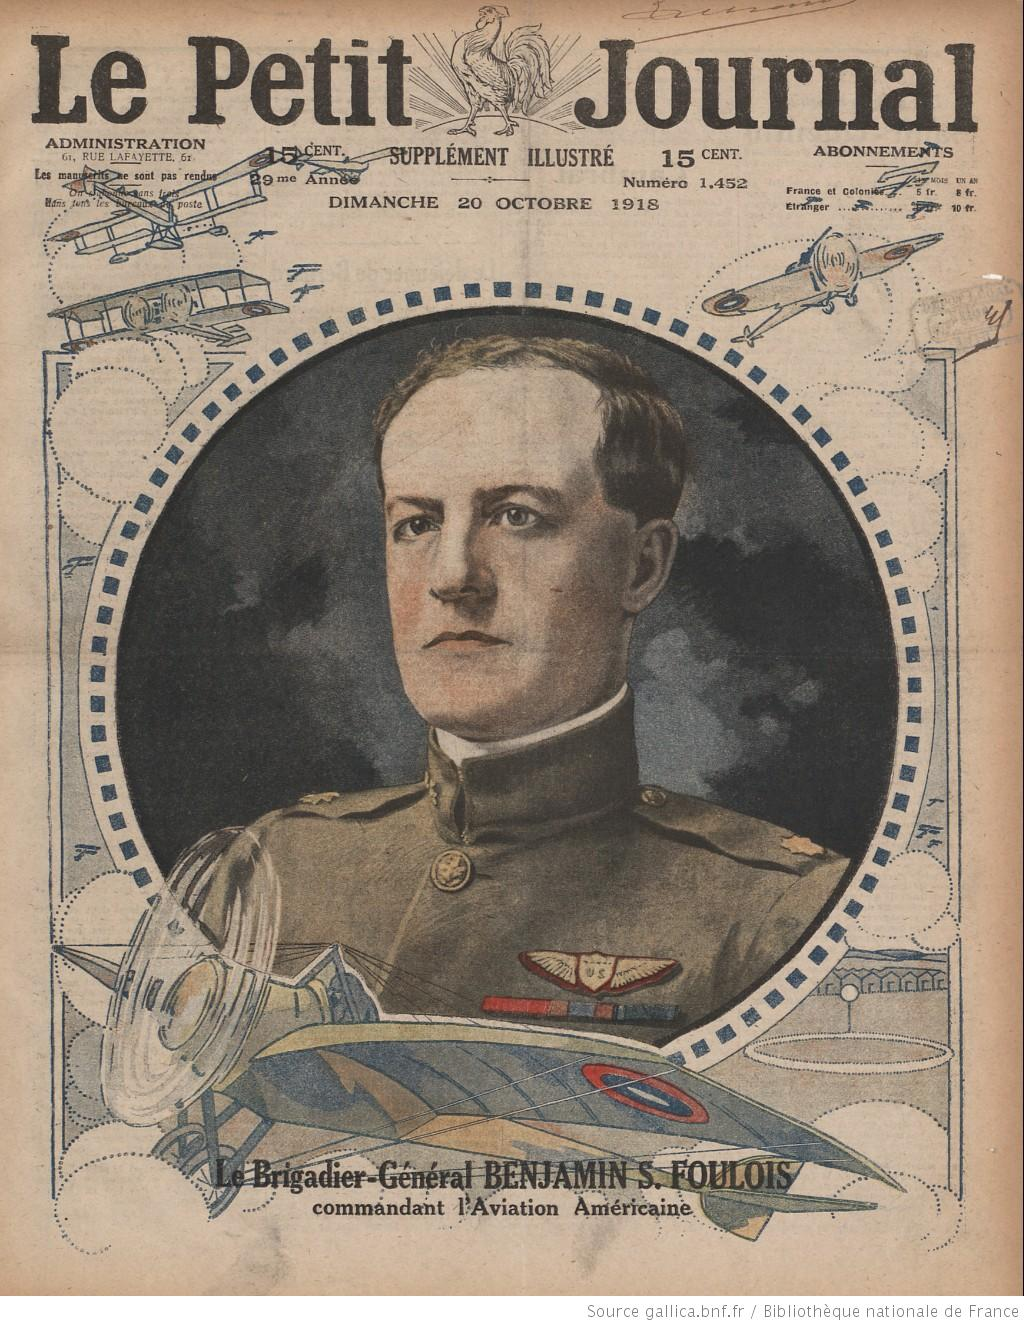 LPJ Illustre 1918-10-20 A.jpg